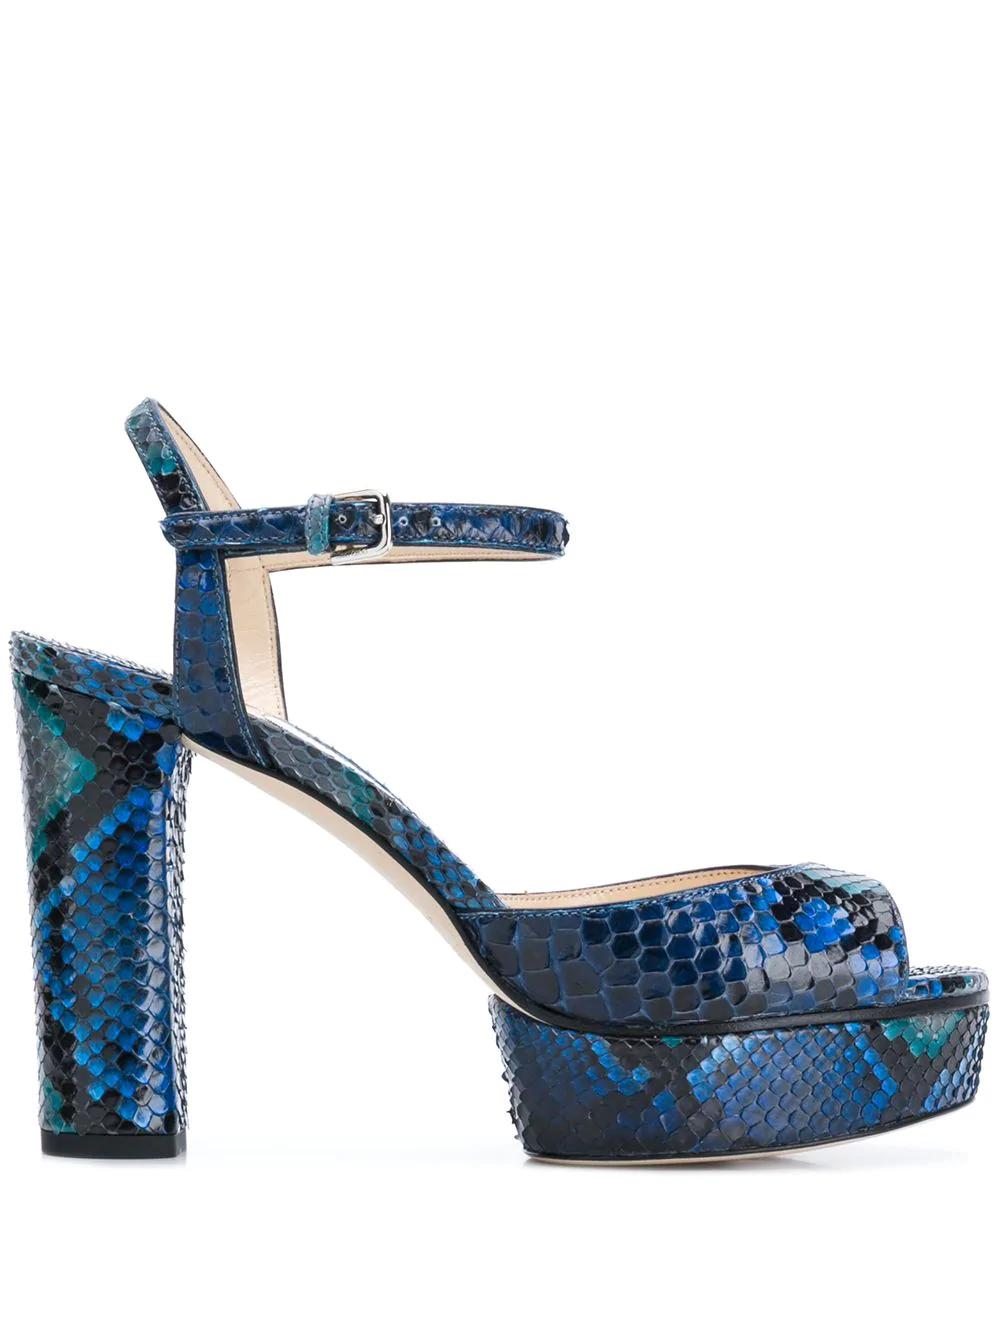 Jimmy Choo Peachy 105 Platform Sandals - Blue